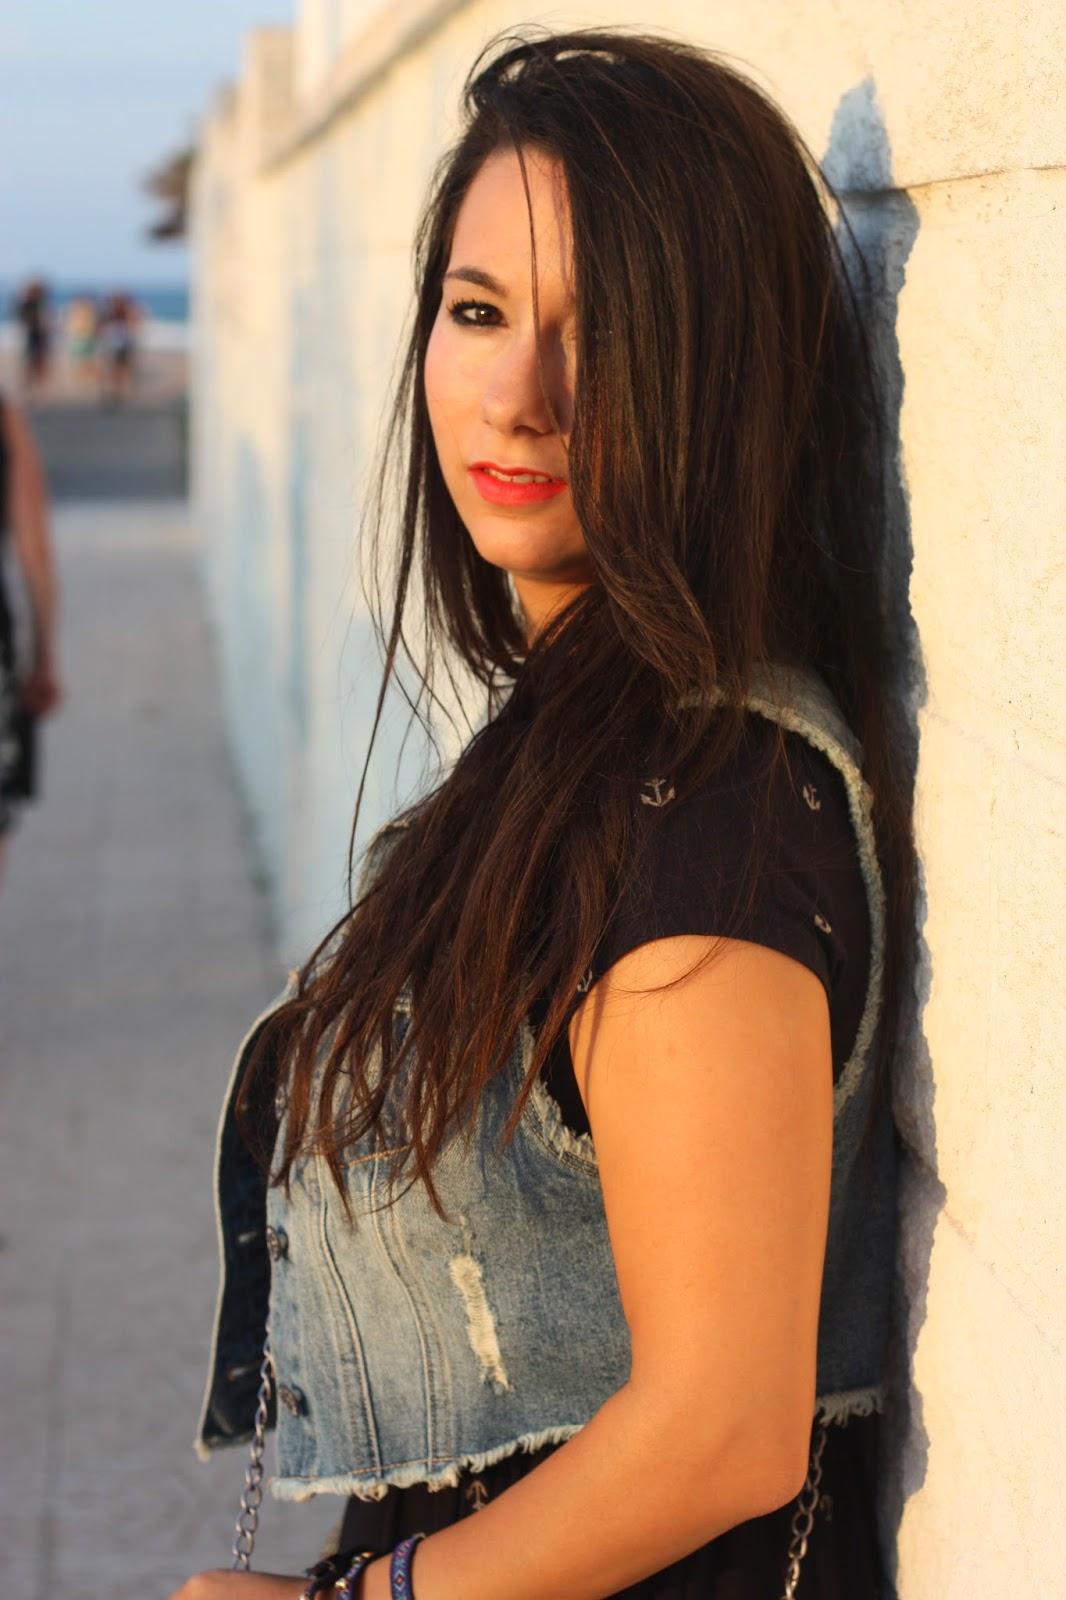 http://silviparalasamigas.blogspot.com.es/2014/07/vestido-estampado-anclas.html